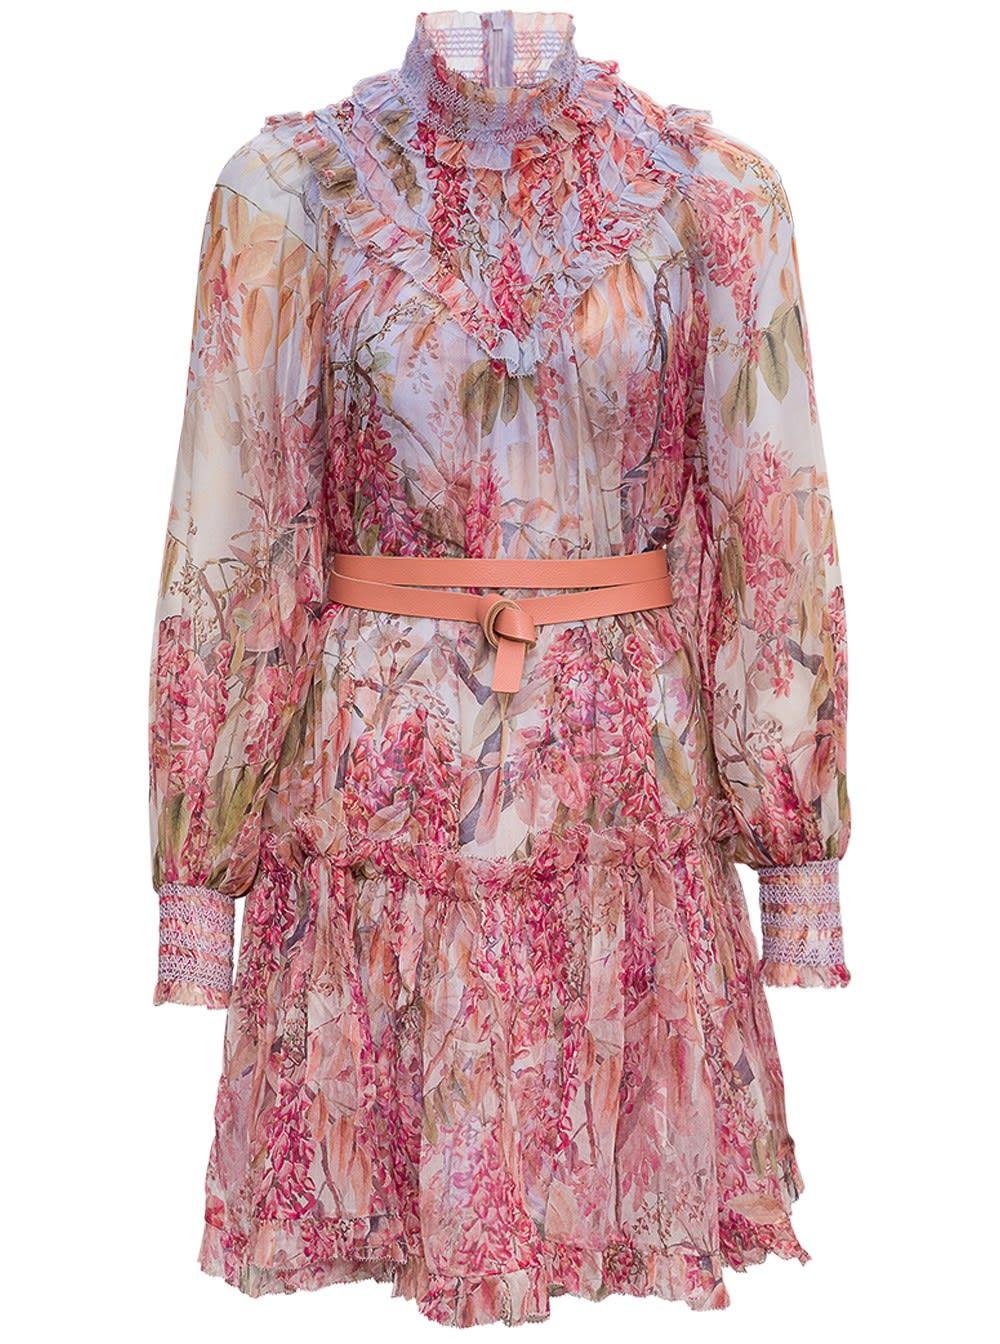 Zimmermann Botanica Smocked Yoke Dress With Belt